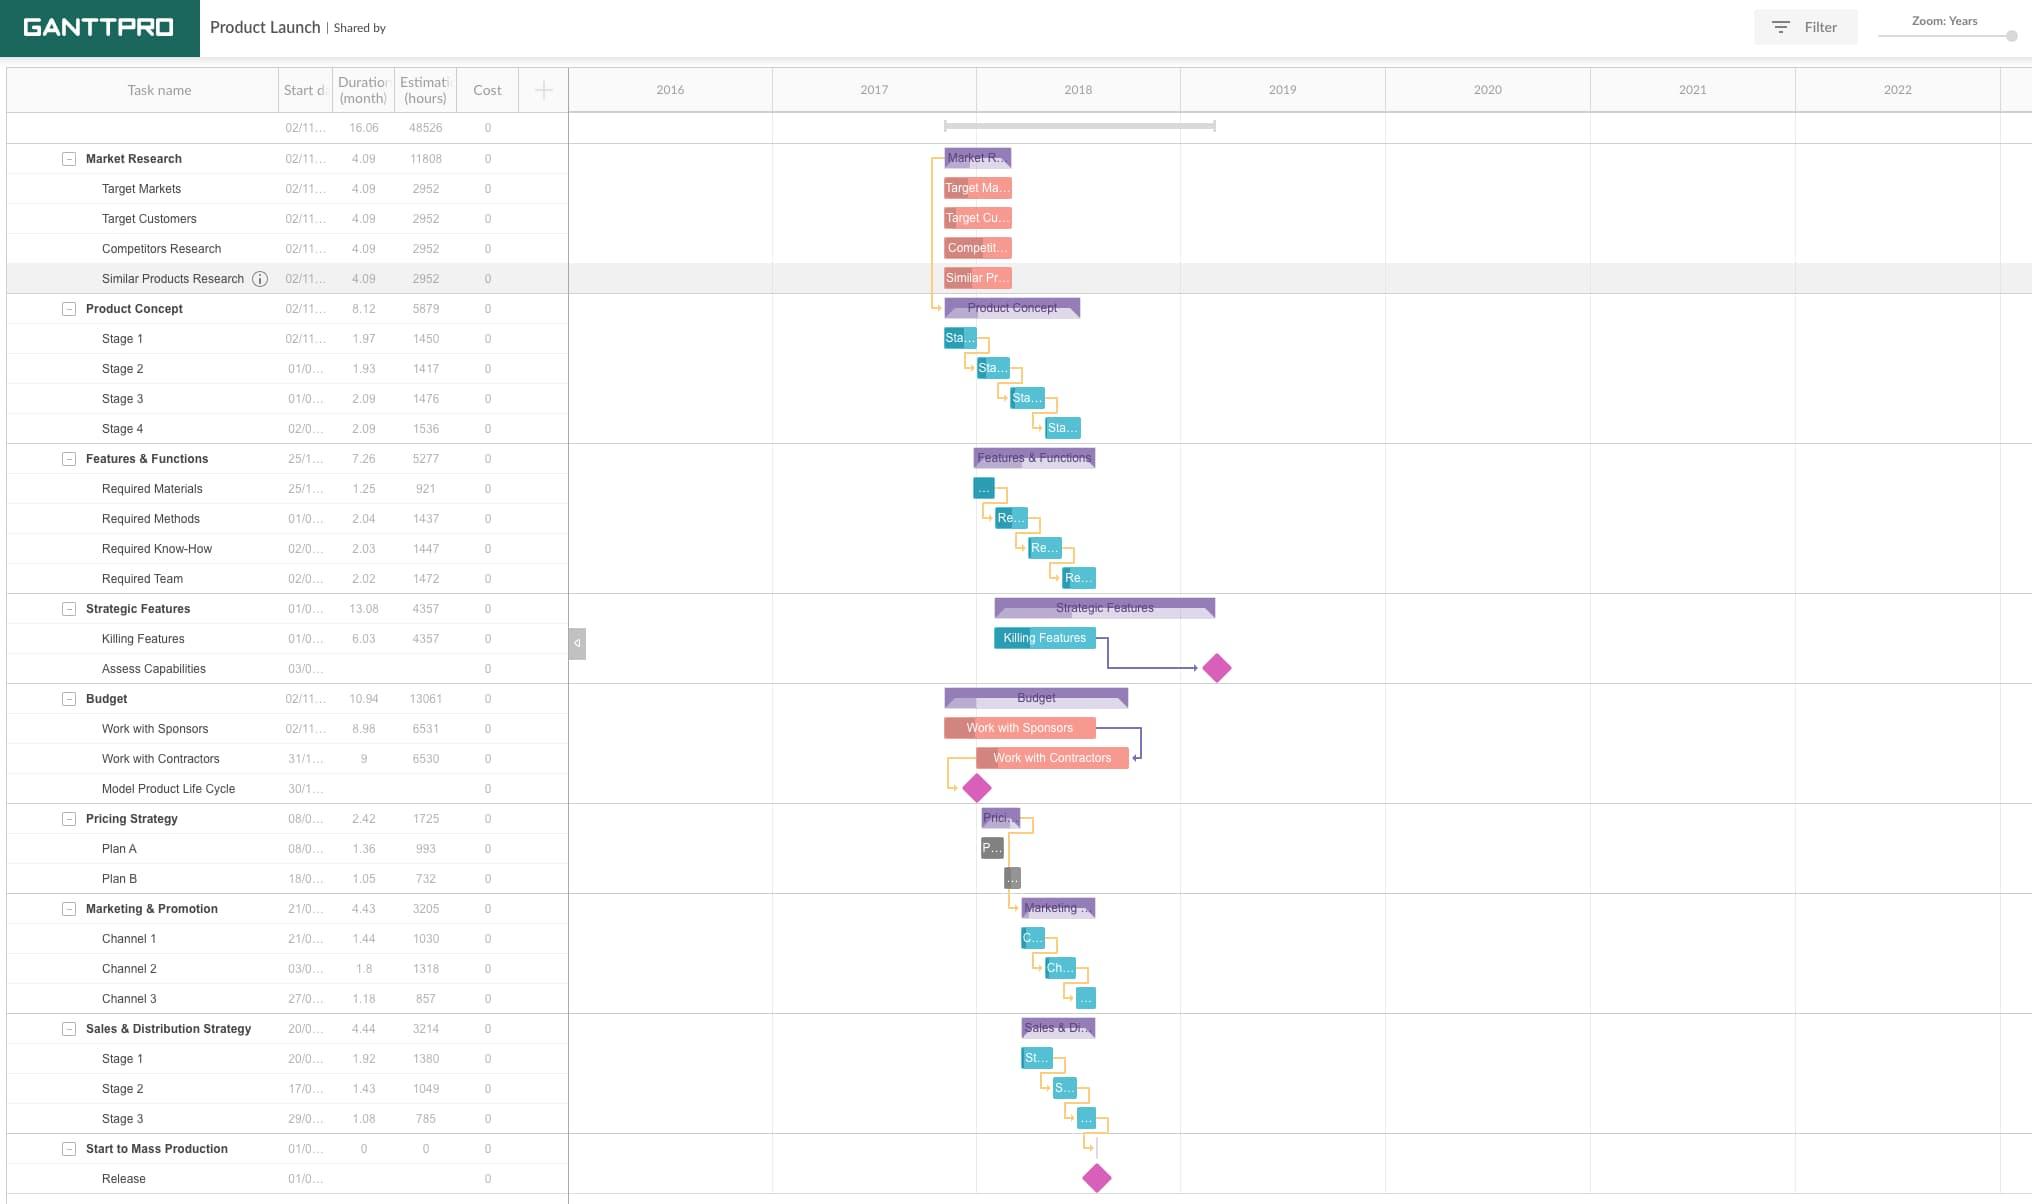 gantt chart example: product launch